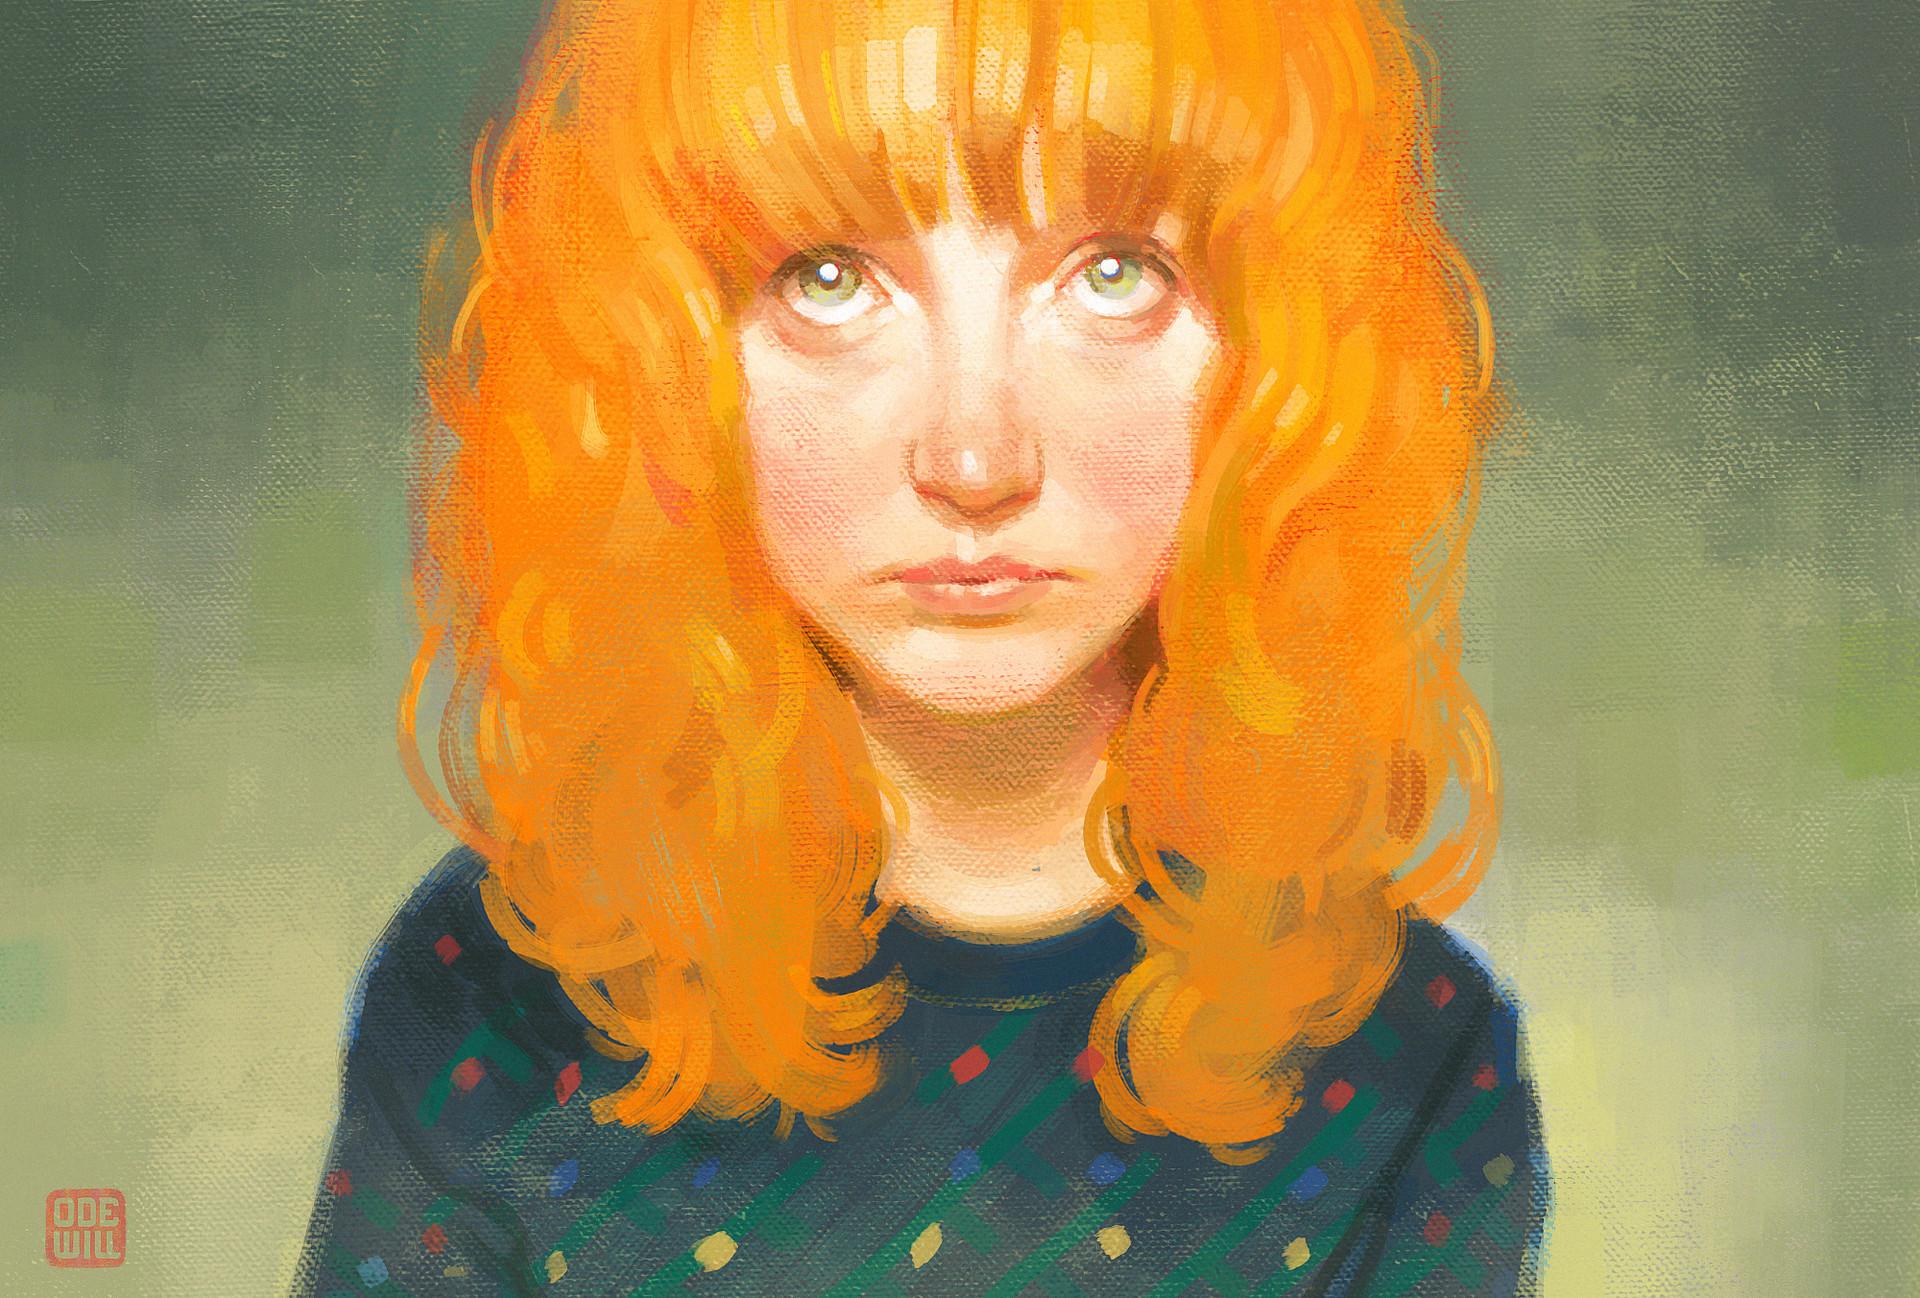 Odewill paco martinez 04 per redhead child